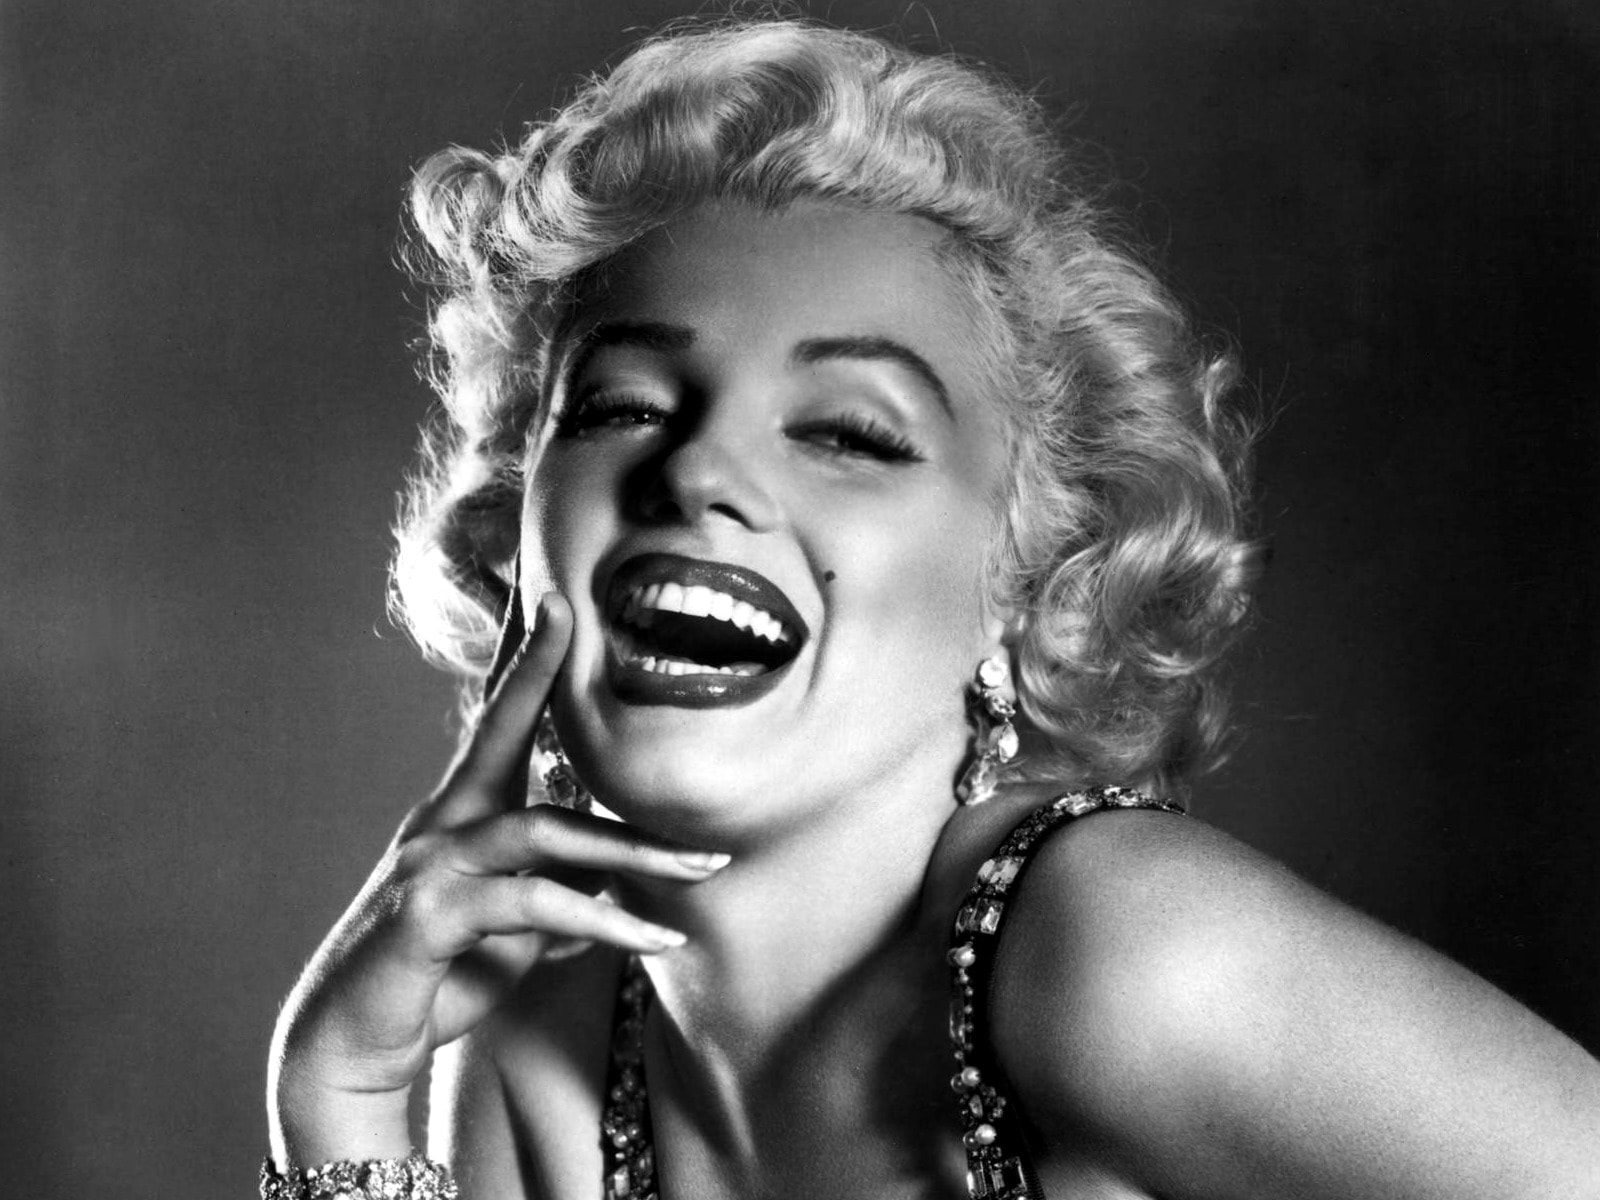 Marilyn Monroe Widescreen for desktop